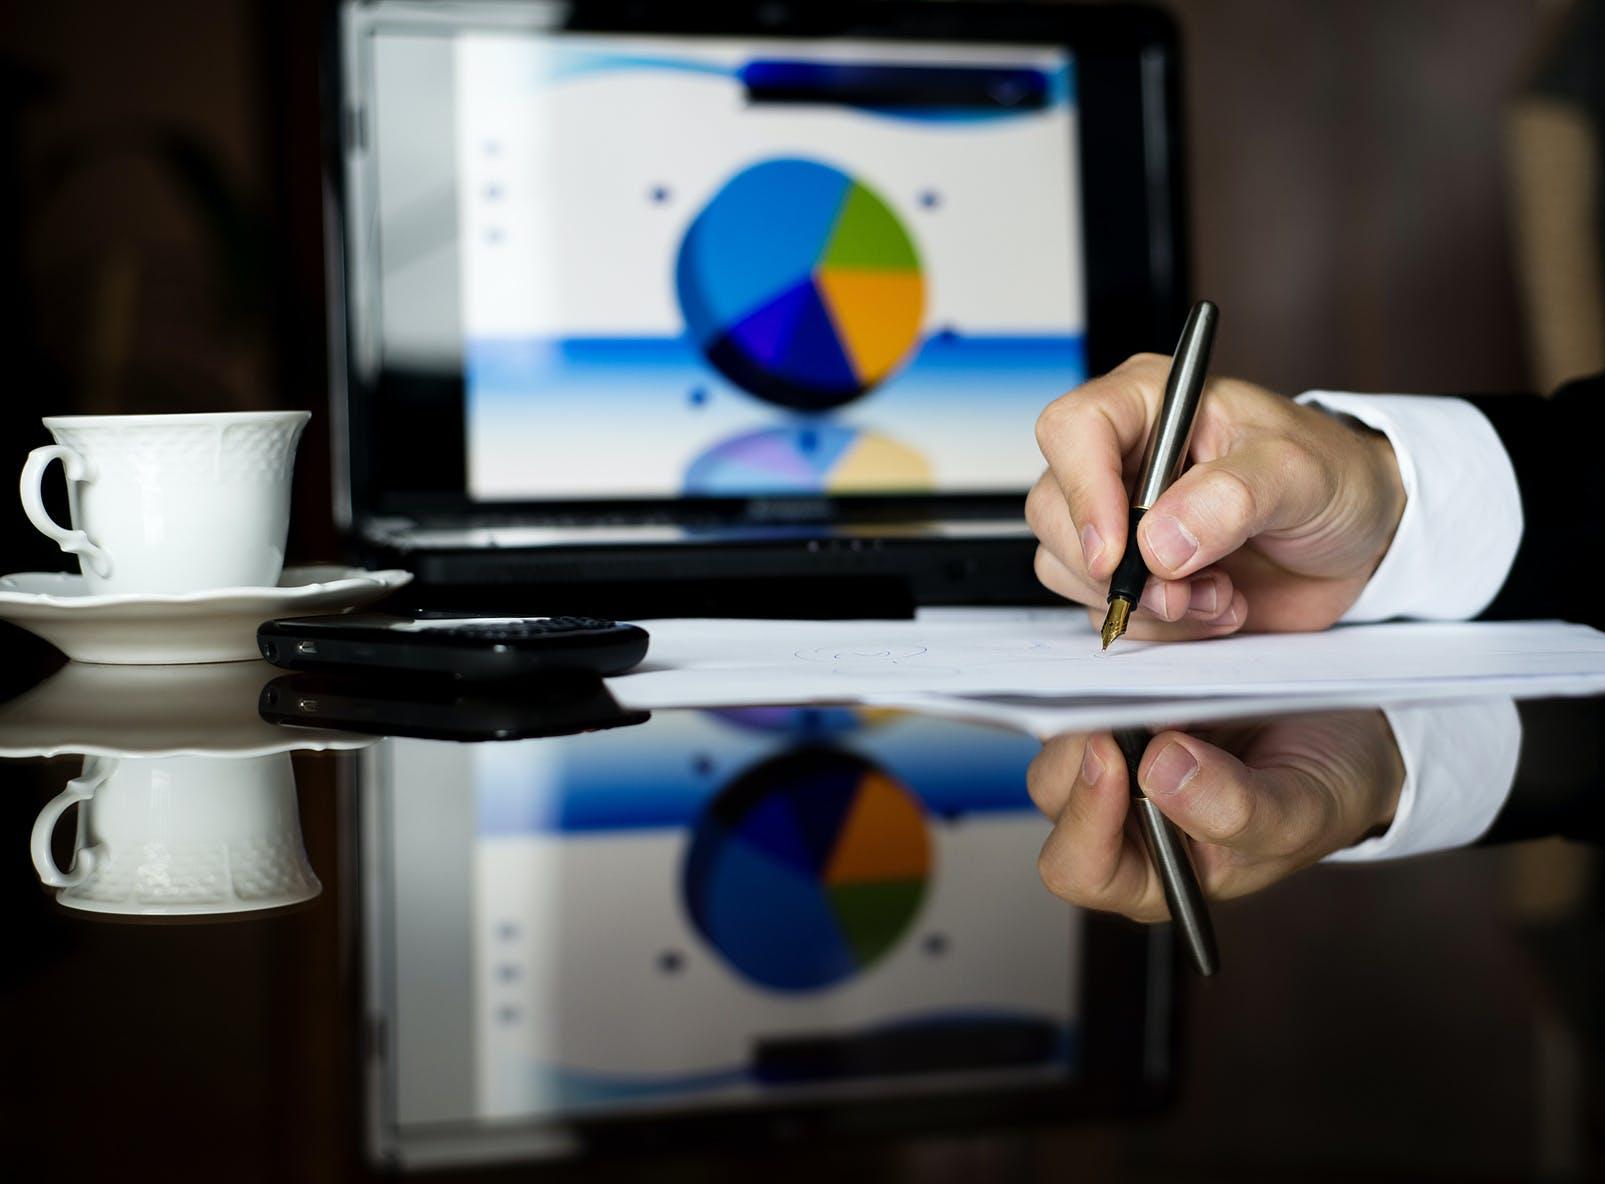 Office Online: Microsoft soll an kostenloser Office-Suite arbeiten